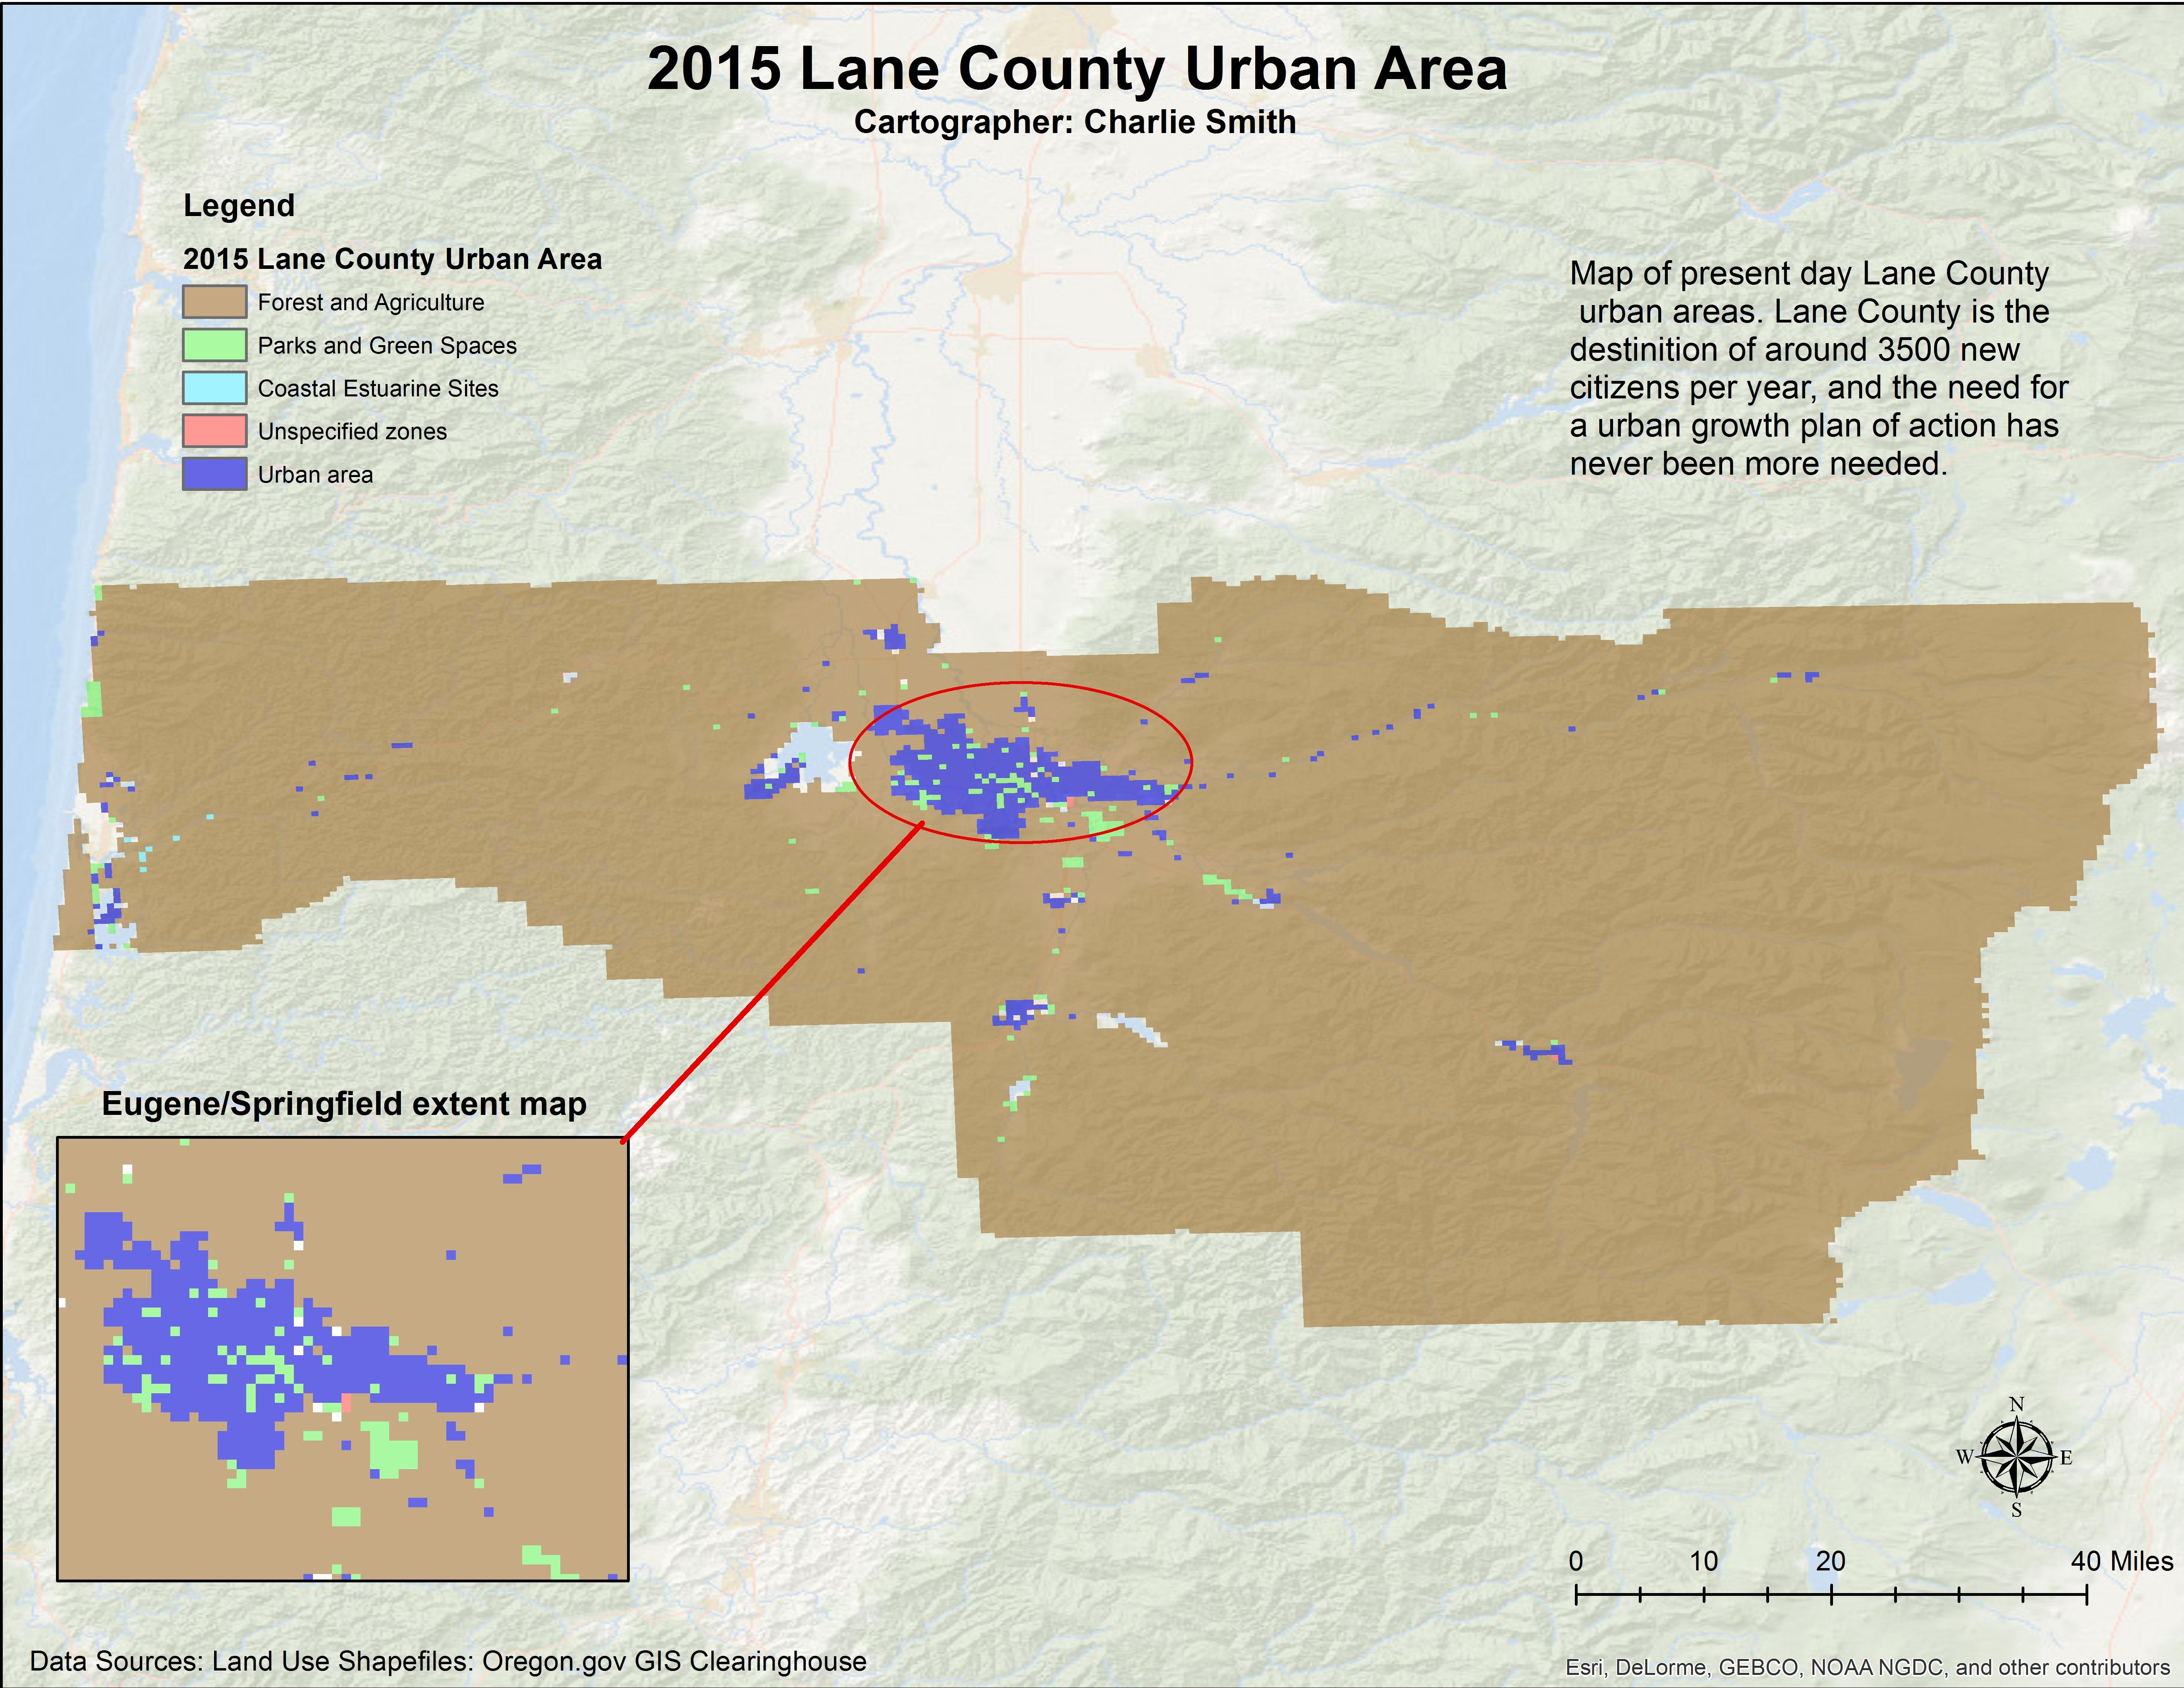 GIS II Final Project: Projecting Urban Growth Scenarios